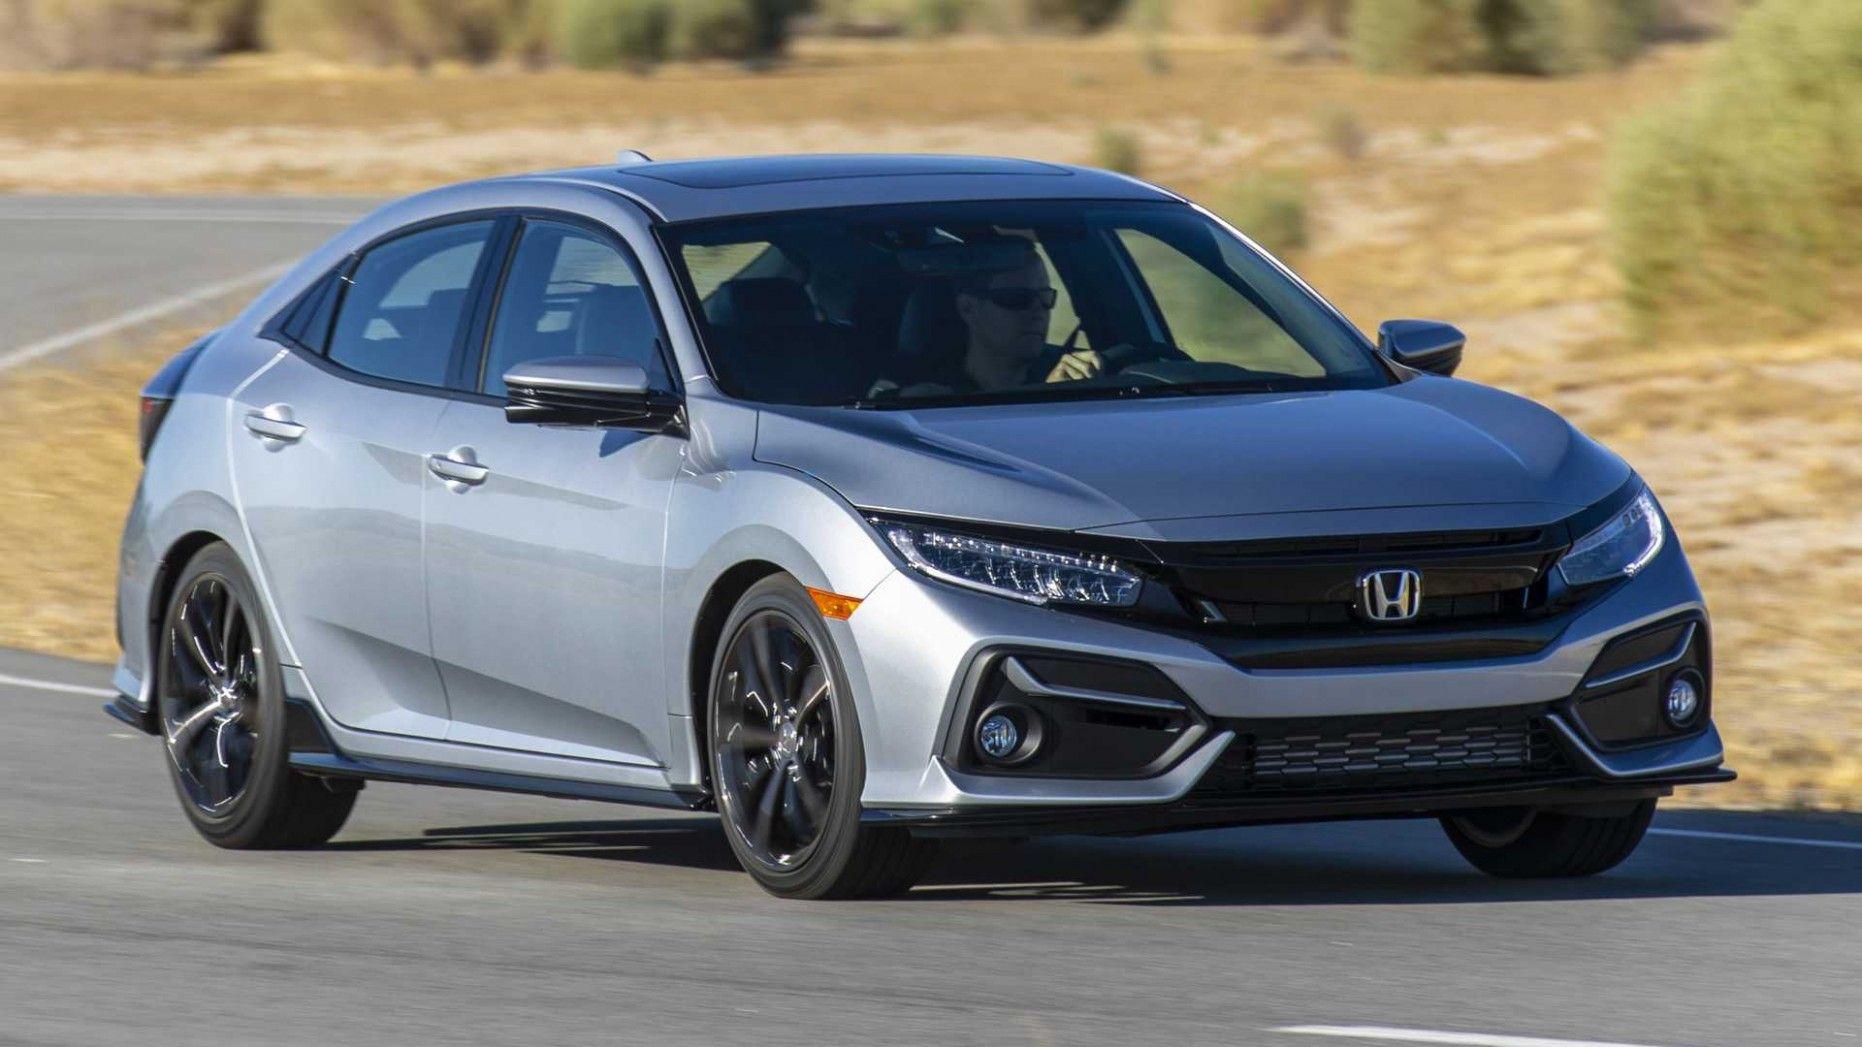 2020 Honda Civic Hybrid Release in 2020 Honda civic